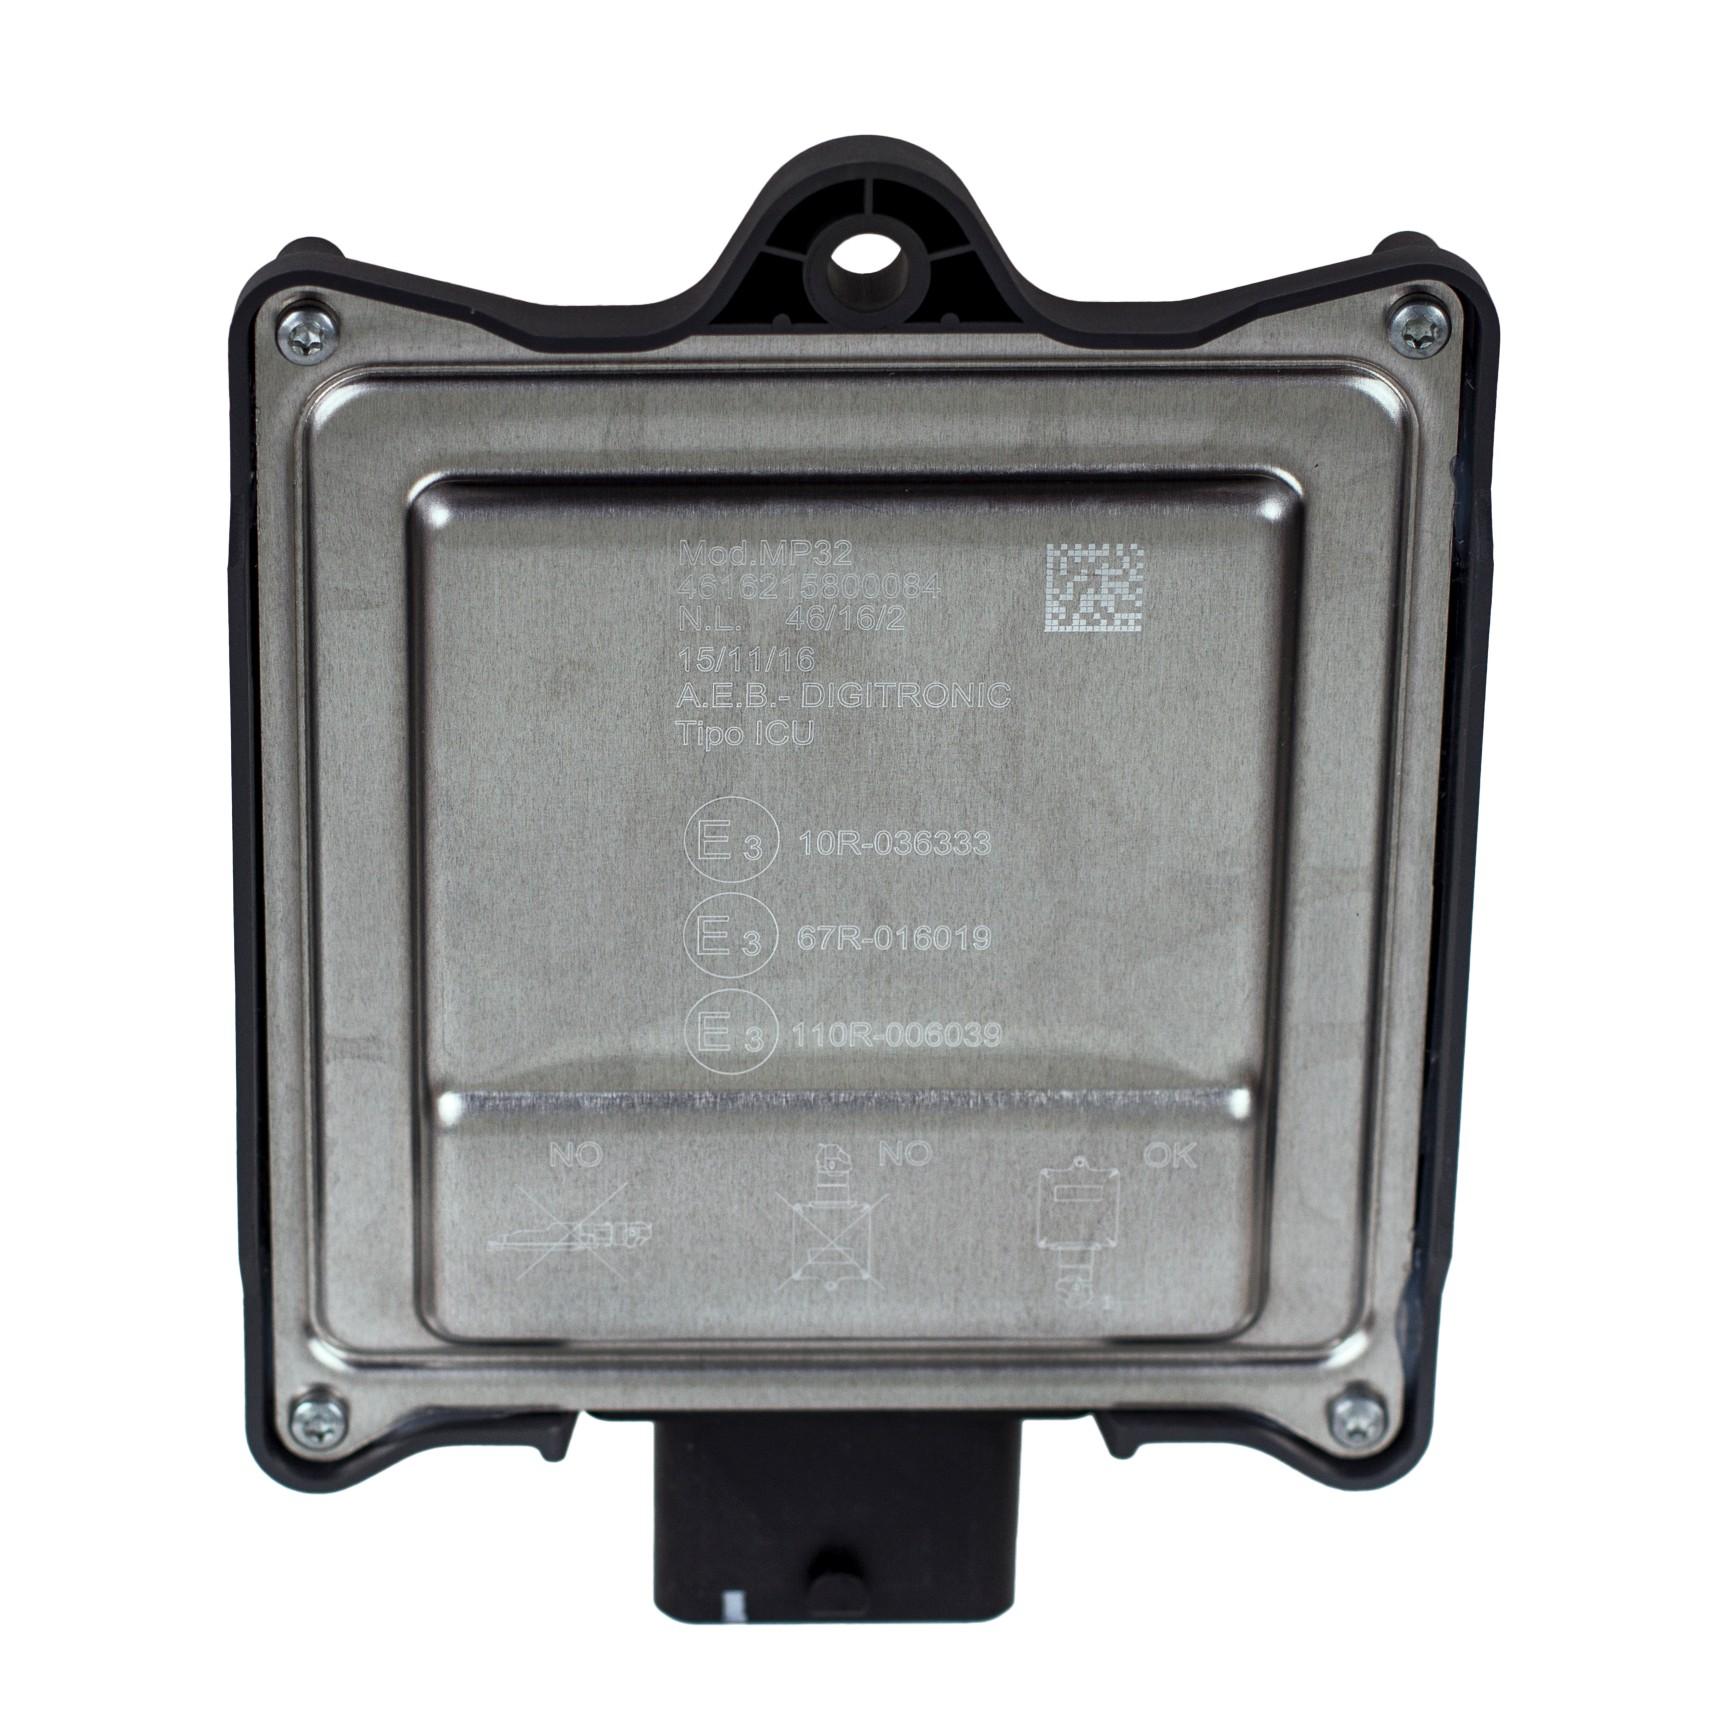 Electronics - Digitronic AEB MP 32